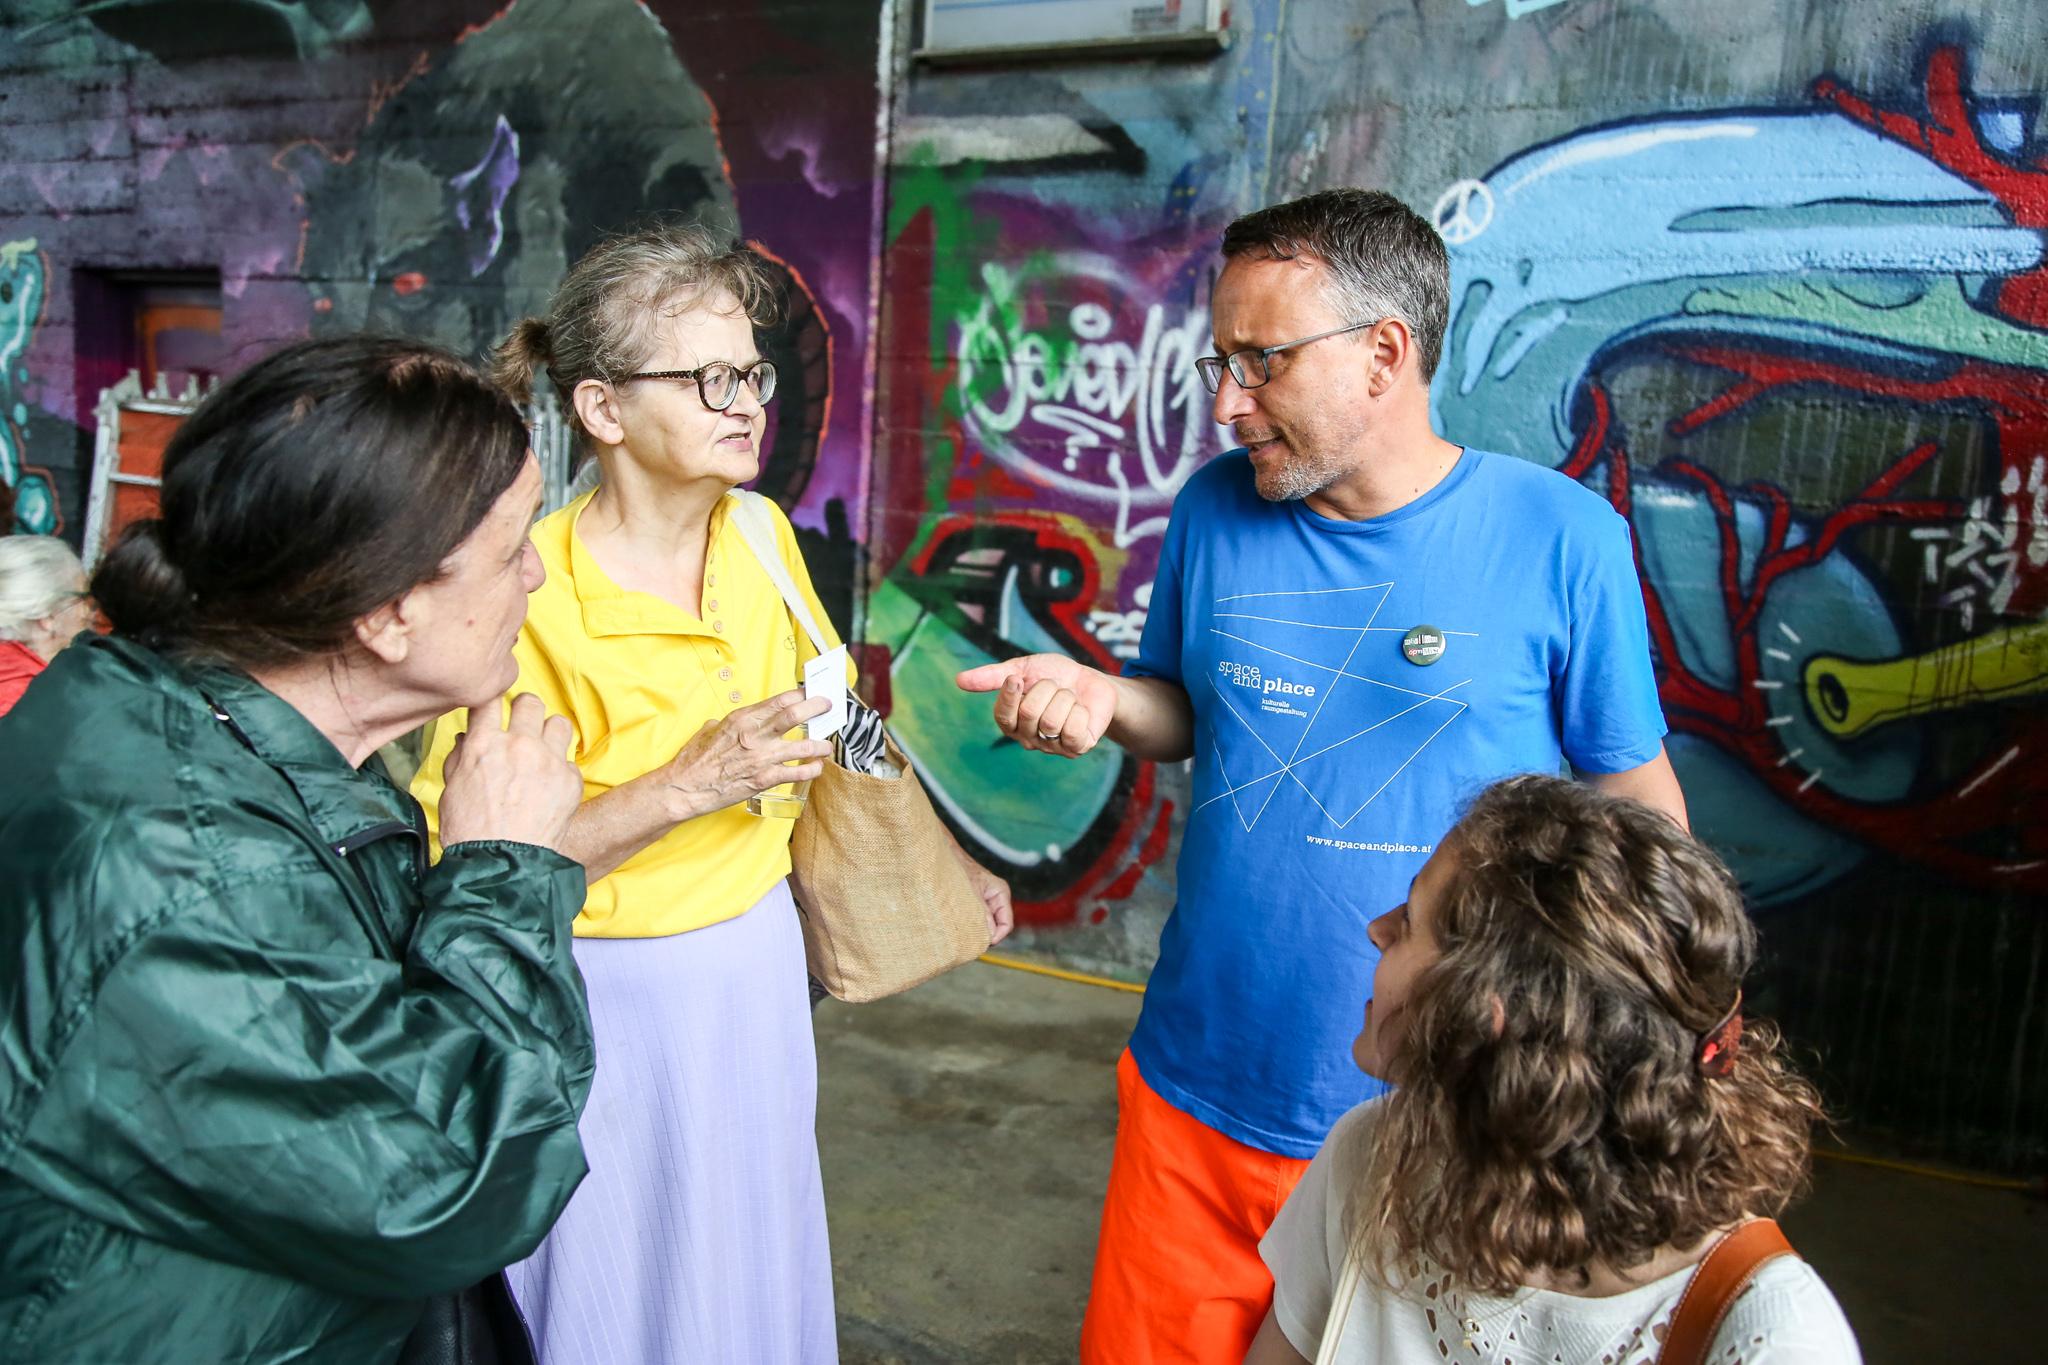 Eugene Quinn im Gespräch mit Teilnehmerinnen am Geh-Café am Donaukanal